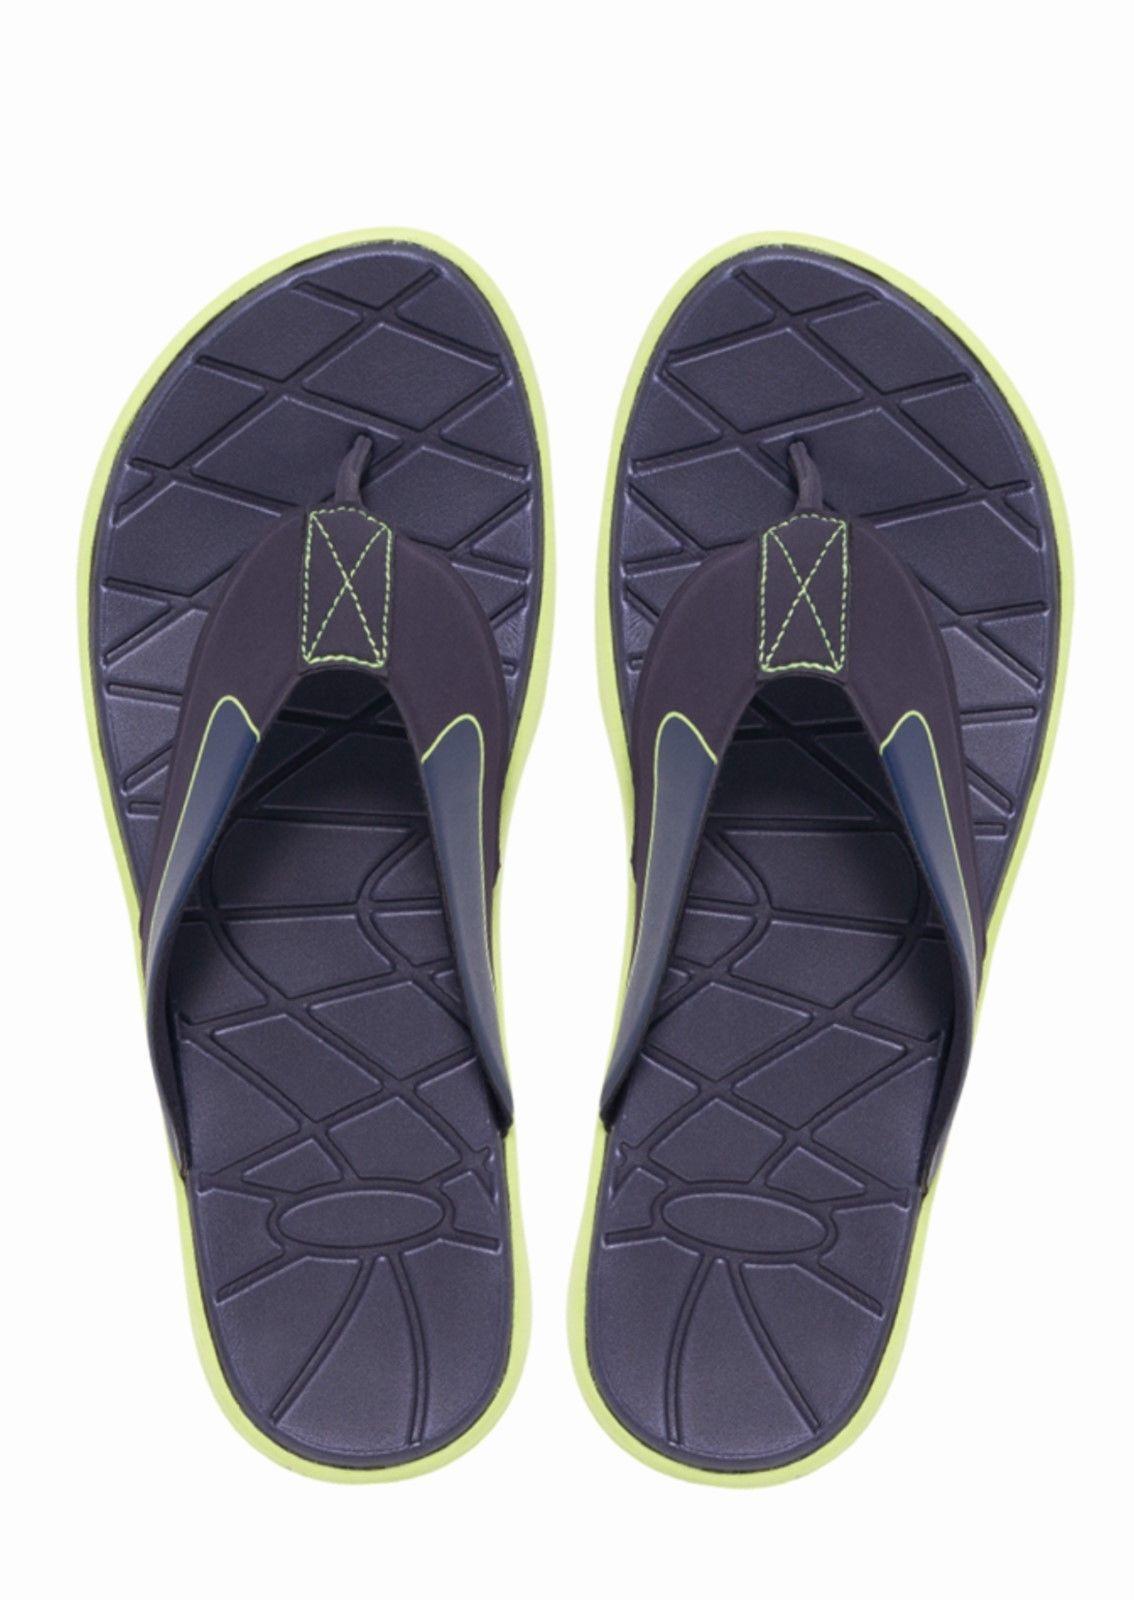 herren soft badepantoletten badeschuhe sandalen. Black Bedroom Furniture Sets. Home Design Ideas